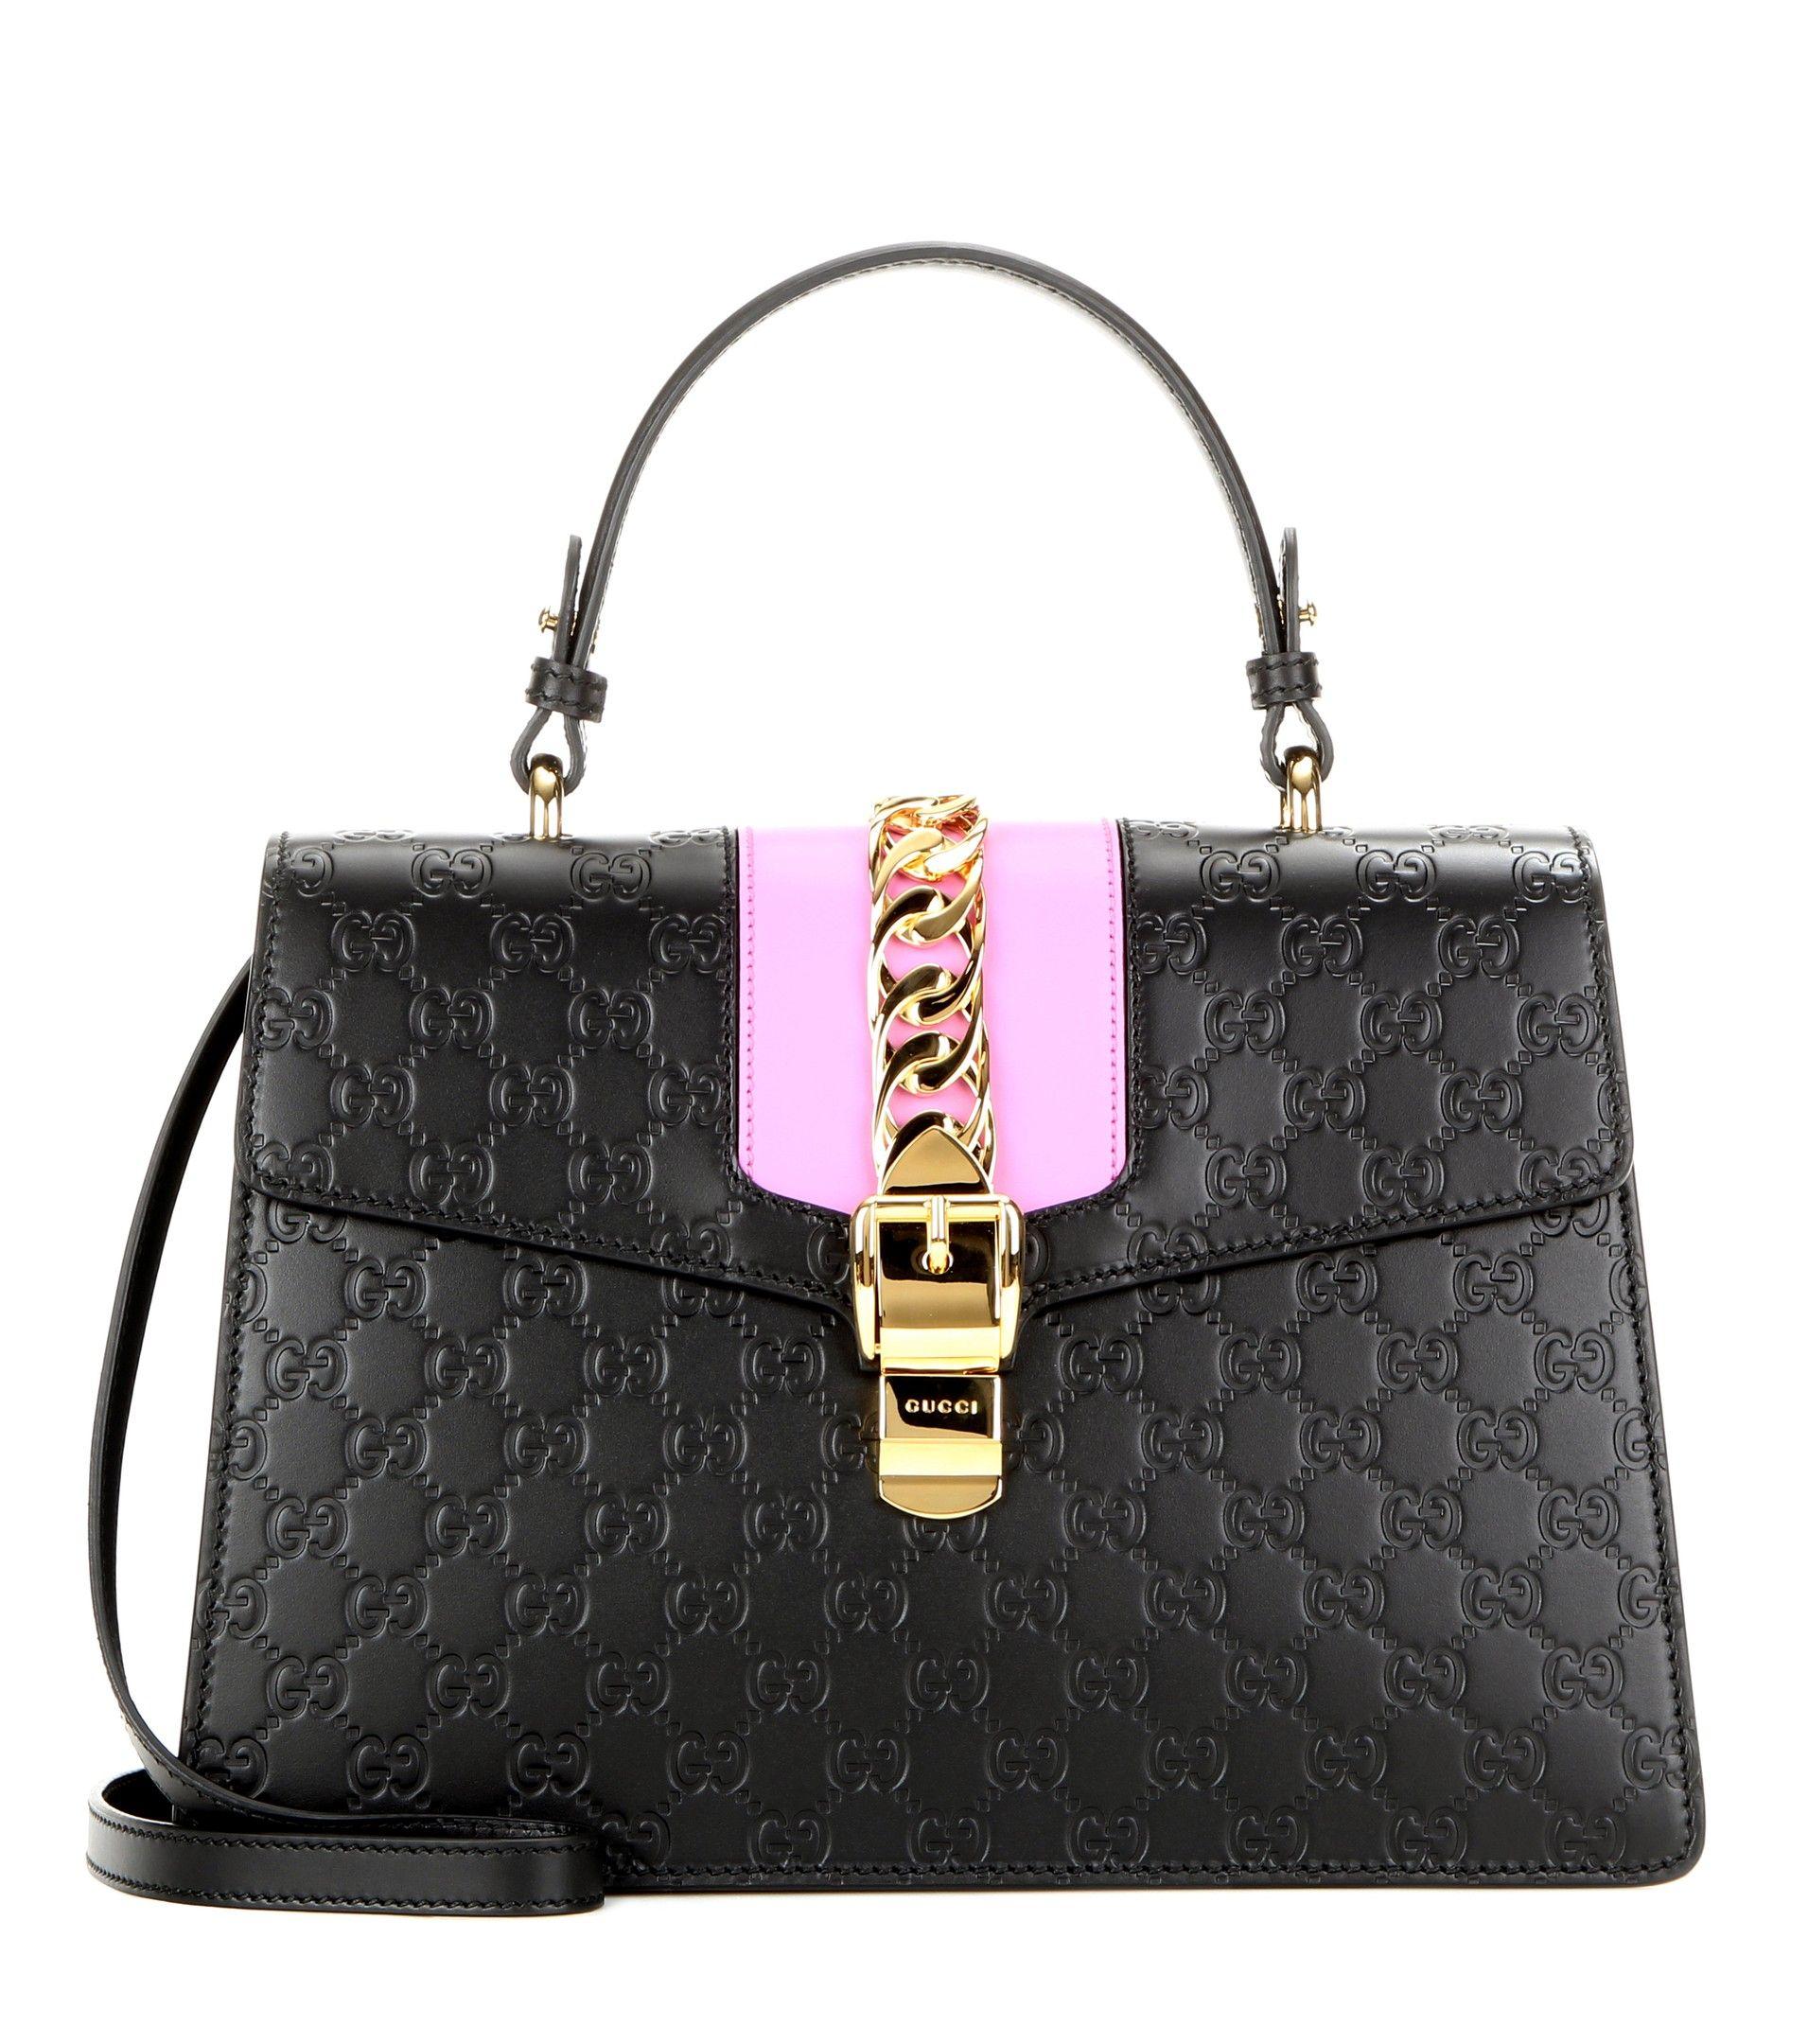 GUCCI Signature Sylvie embossed leather shoulder bag  47dfc83c6ae5